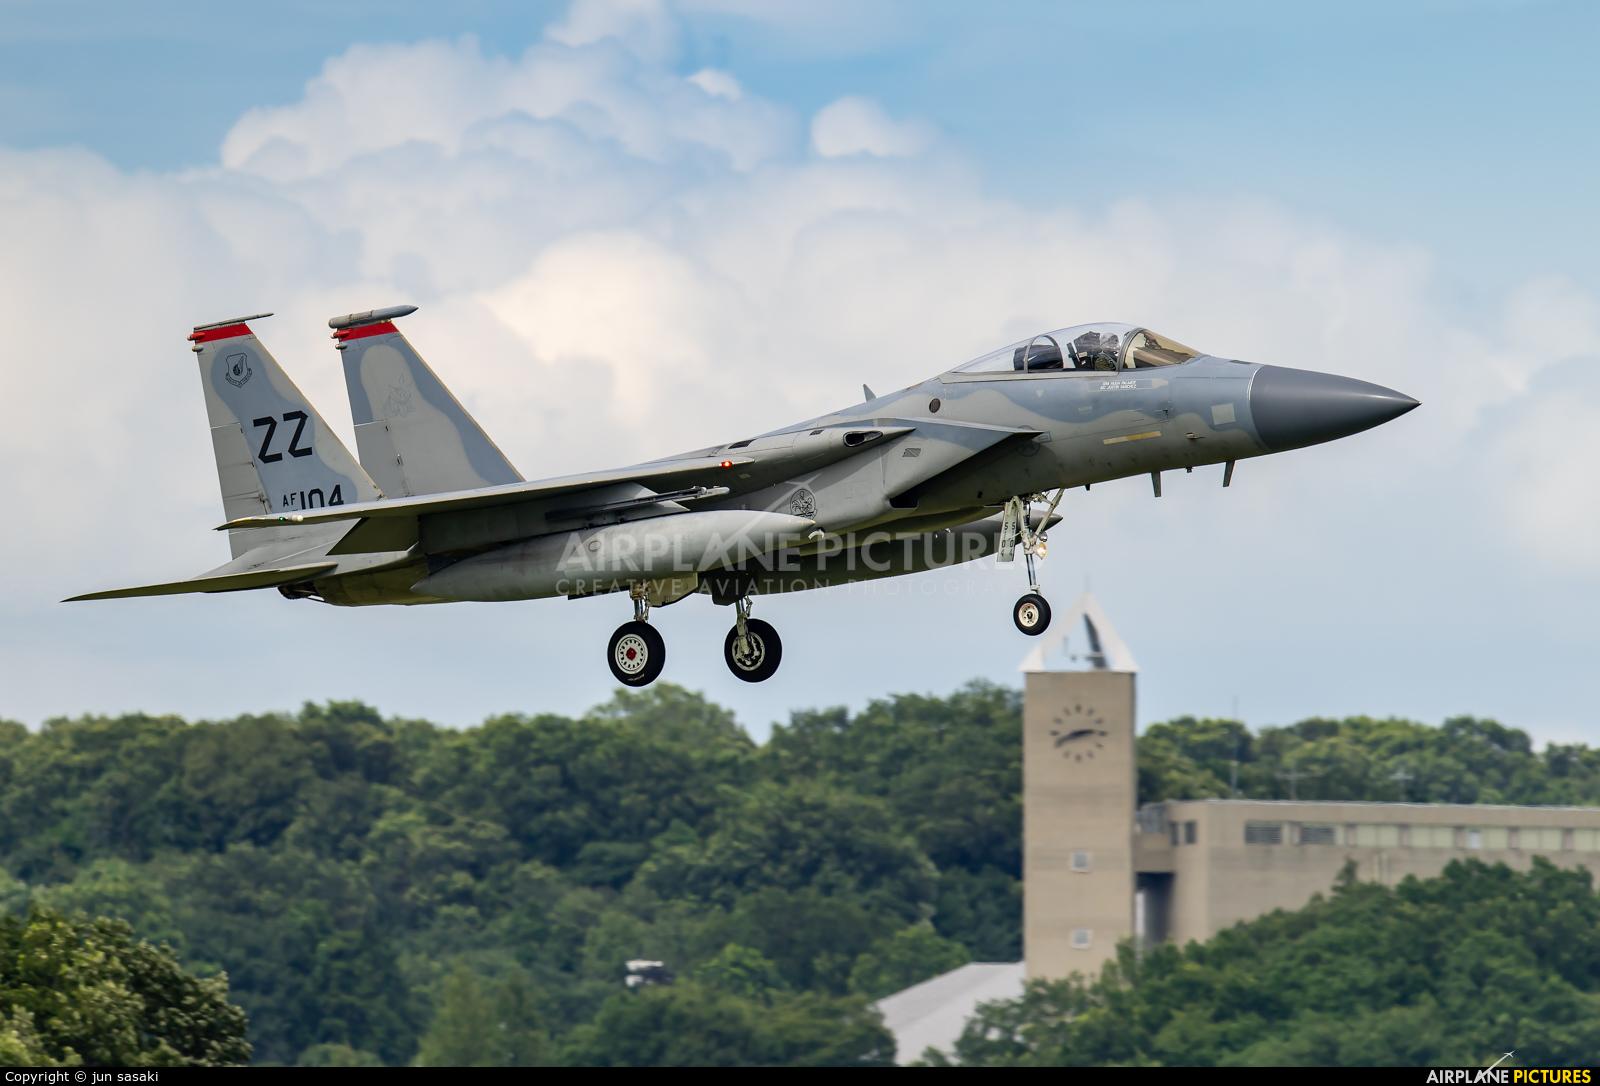 USA - Air Force 85-0104 aircraft at Yokota AB